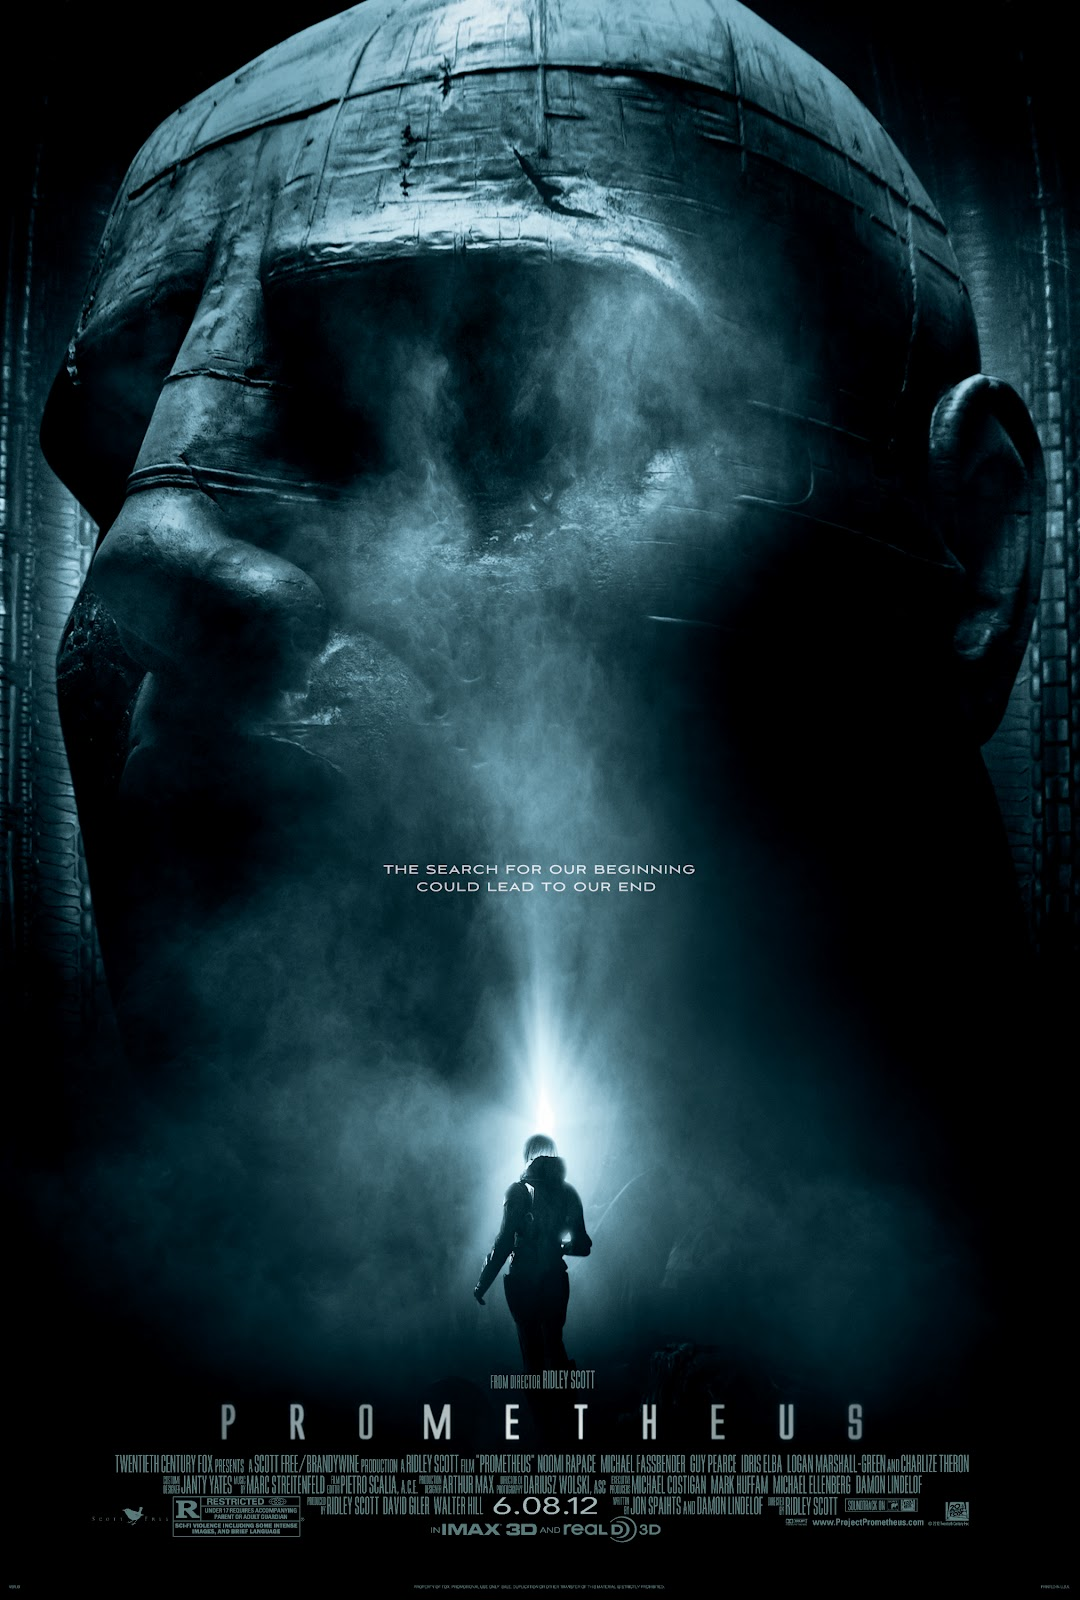 http://1.bp.blogspot.com/--vtcmYM16I4/T9KcynWBo3I/AAAAAAAAAzk/u1V79LzH2yw/s1600/prometheus-official-poster.jpg